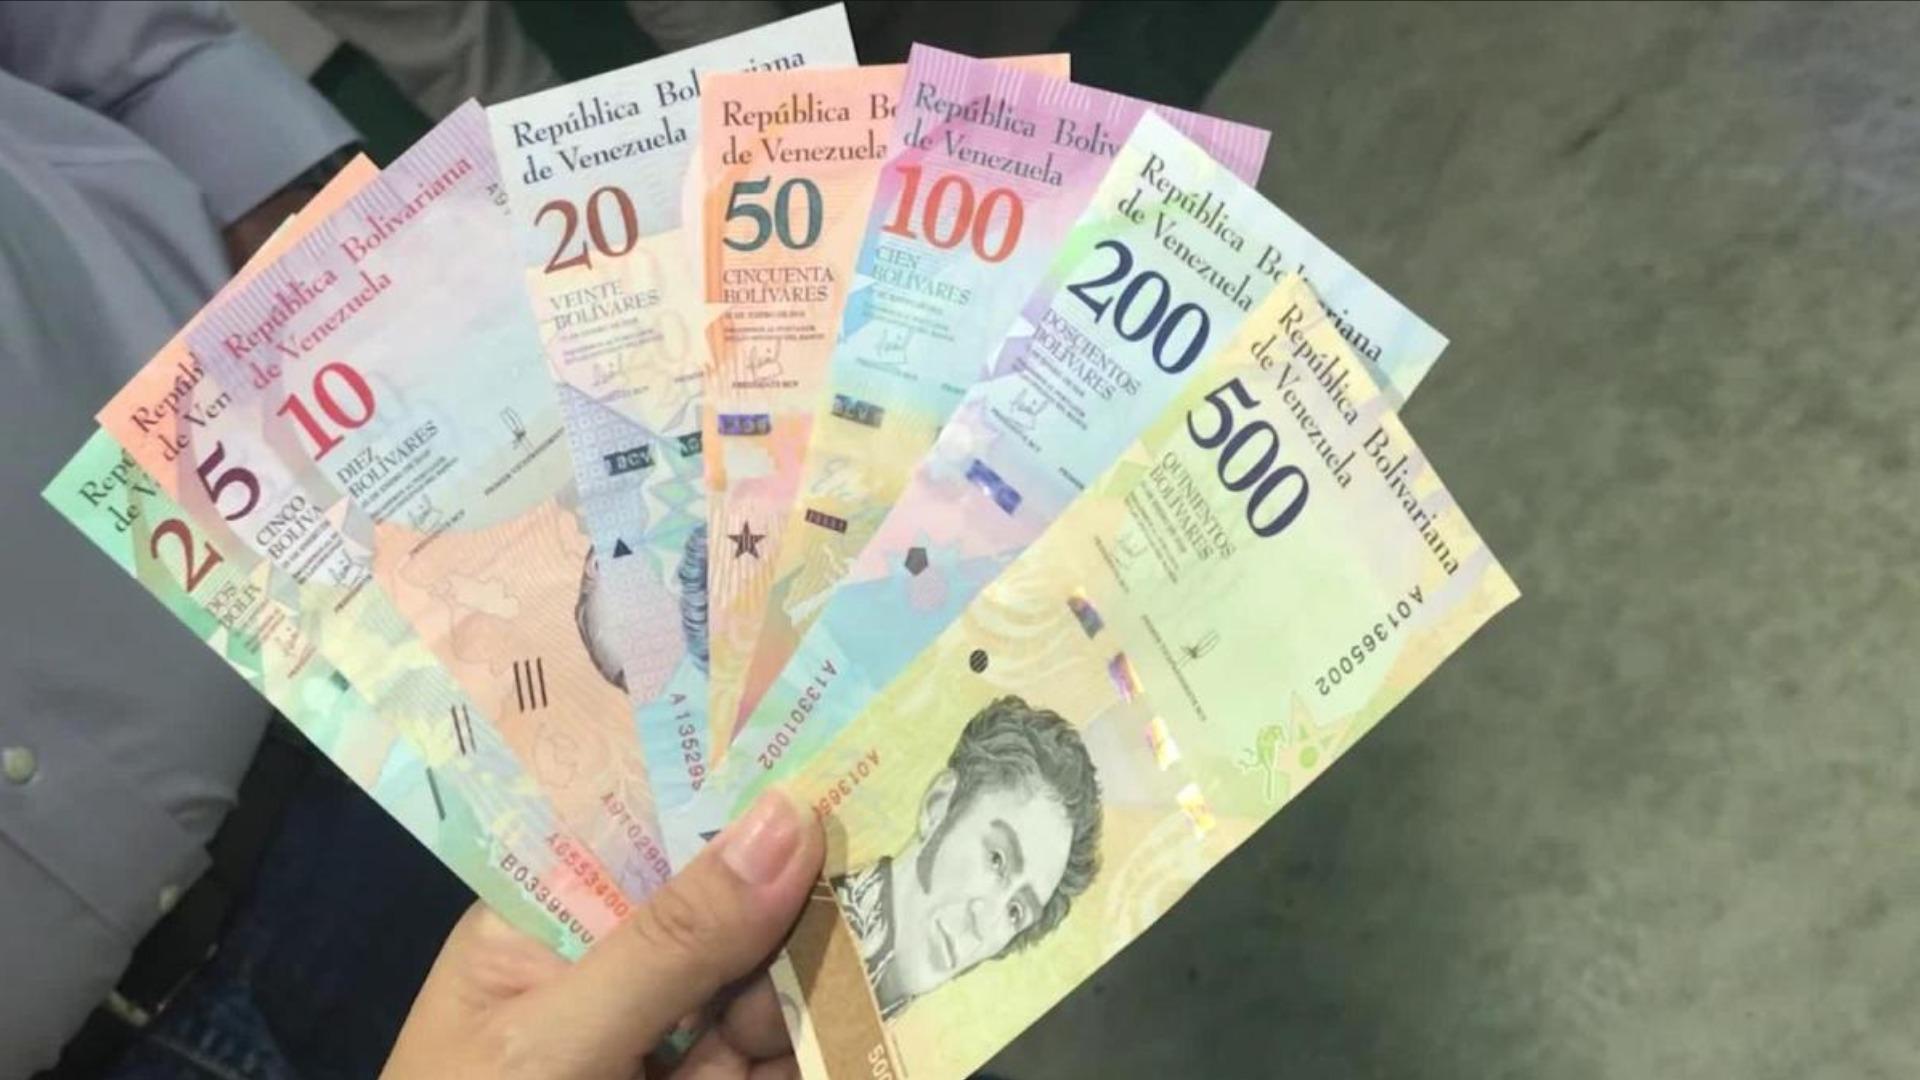 Asamblea Nacional: Economía venezolana se contrajo 43% en tercer trimestre de 2019